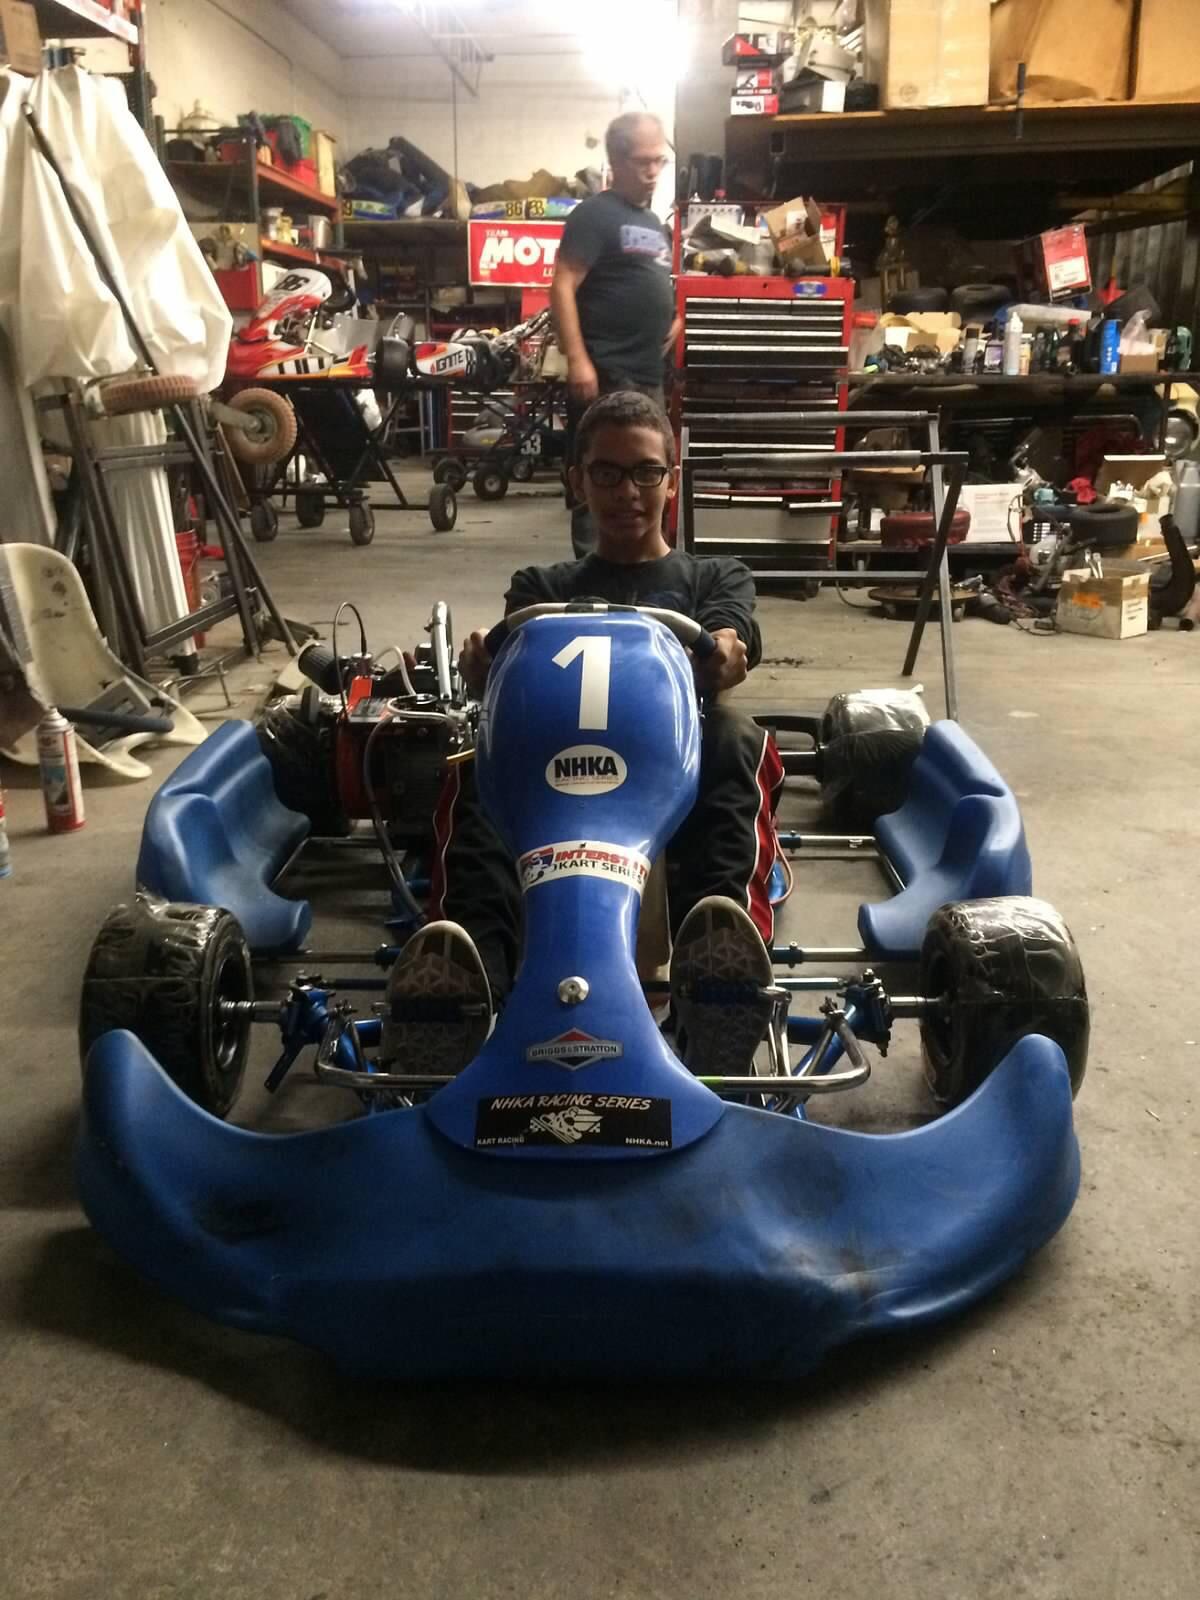 Race-Ready at CF Motorsports Shop